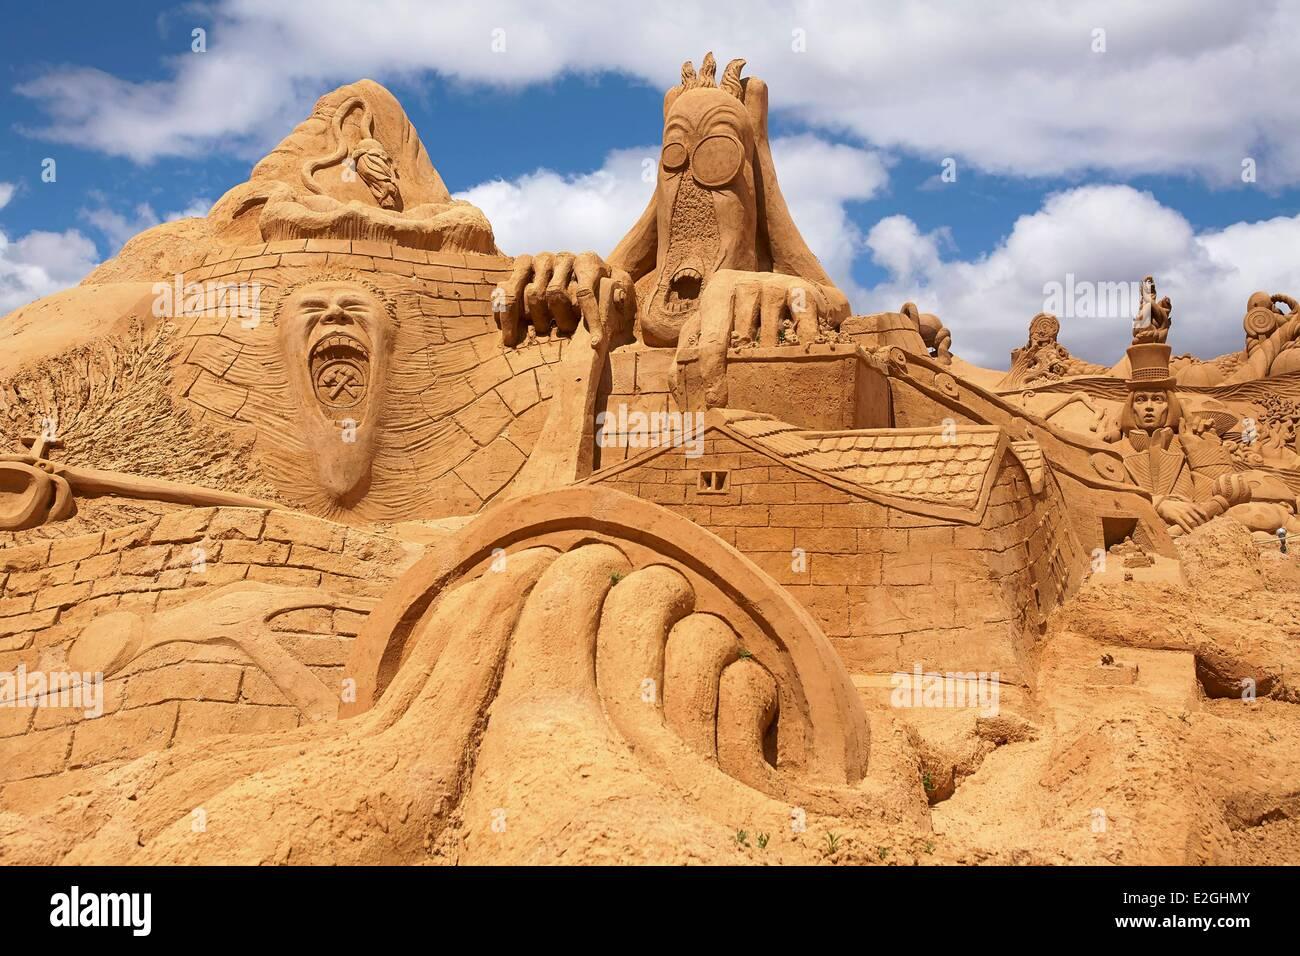 Portugal Algarve Pera International Sand Sculpture Festival FIESA (Festival Internacional de Escultura em Areia) - Stock Image